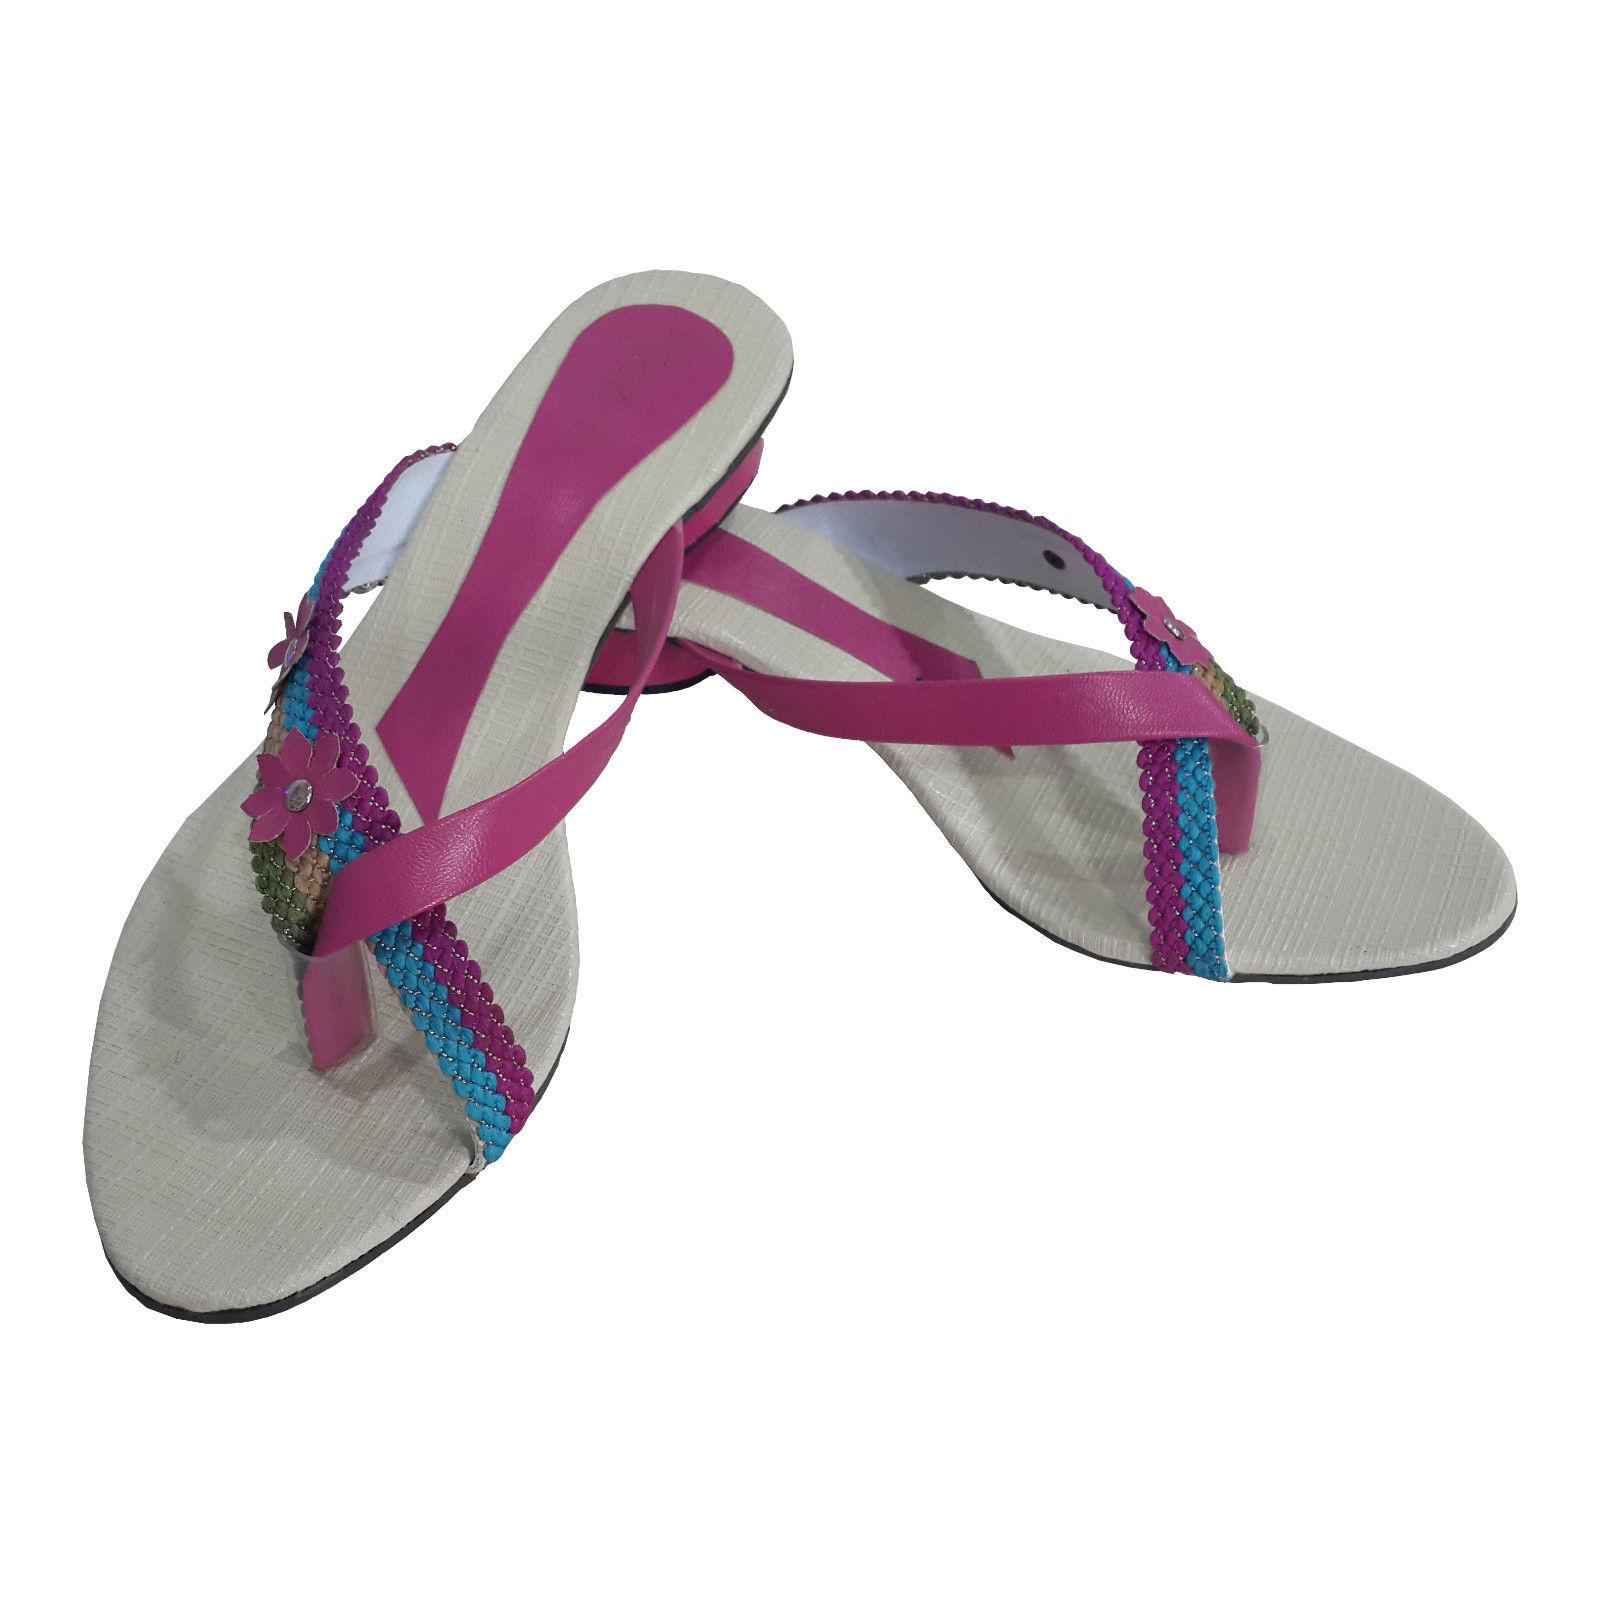 IND-LADIES FOOTWEAR FLAT SANDAL CHAPPAL SLIPPER WOMEN'S